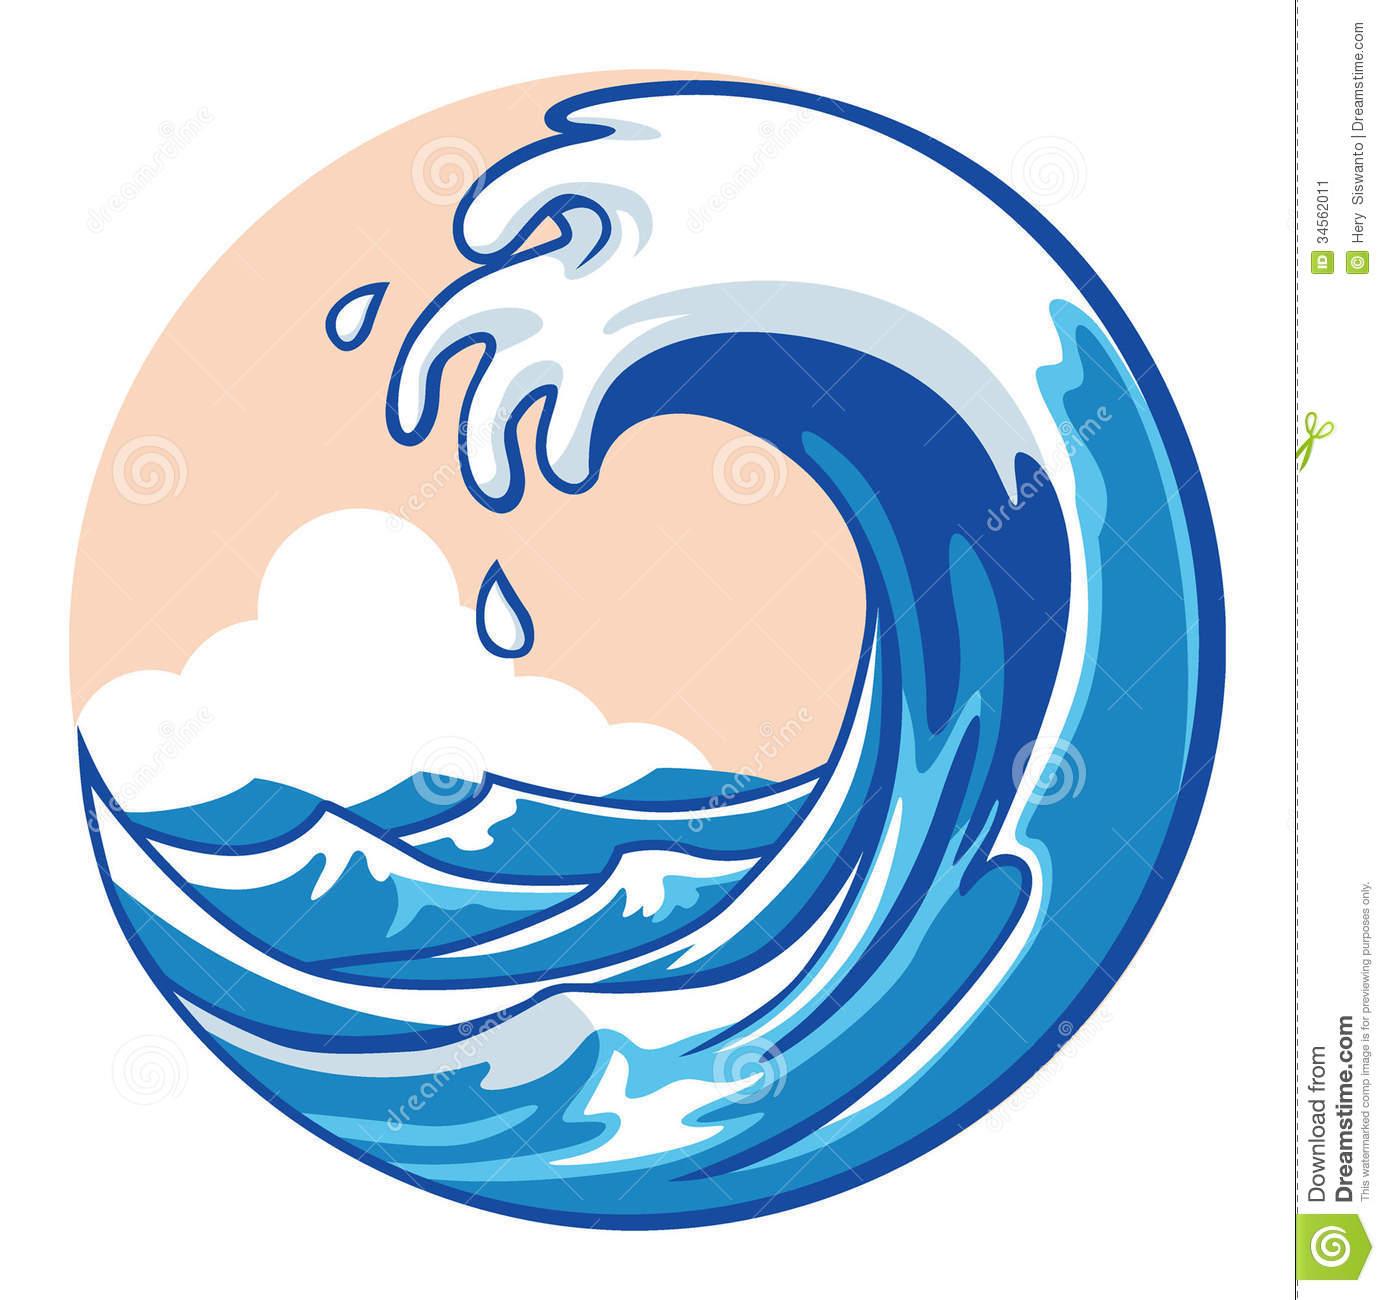 Free Ocean Clipart. Ocean Wave Stock Ima-Free Ocean Clipart. Ocean wave Stock Image-3